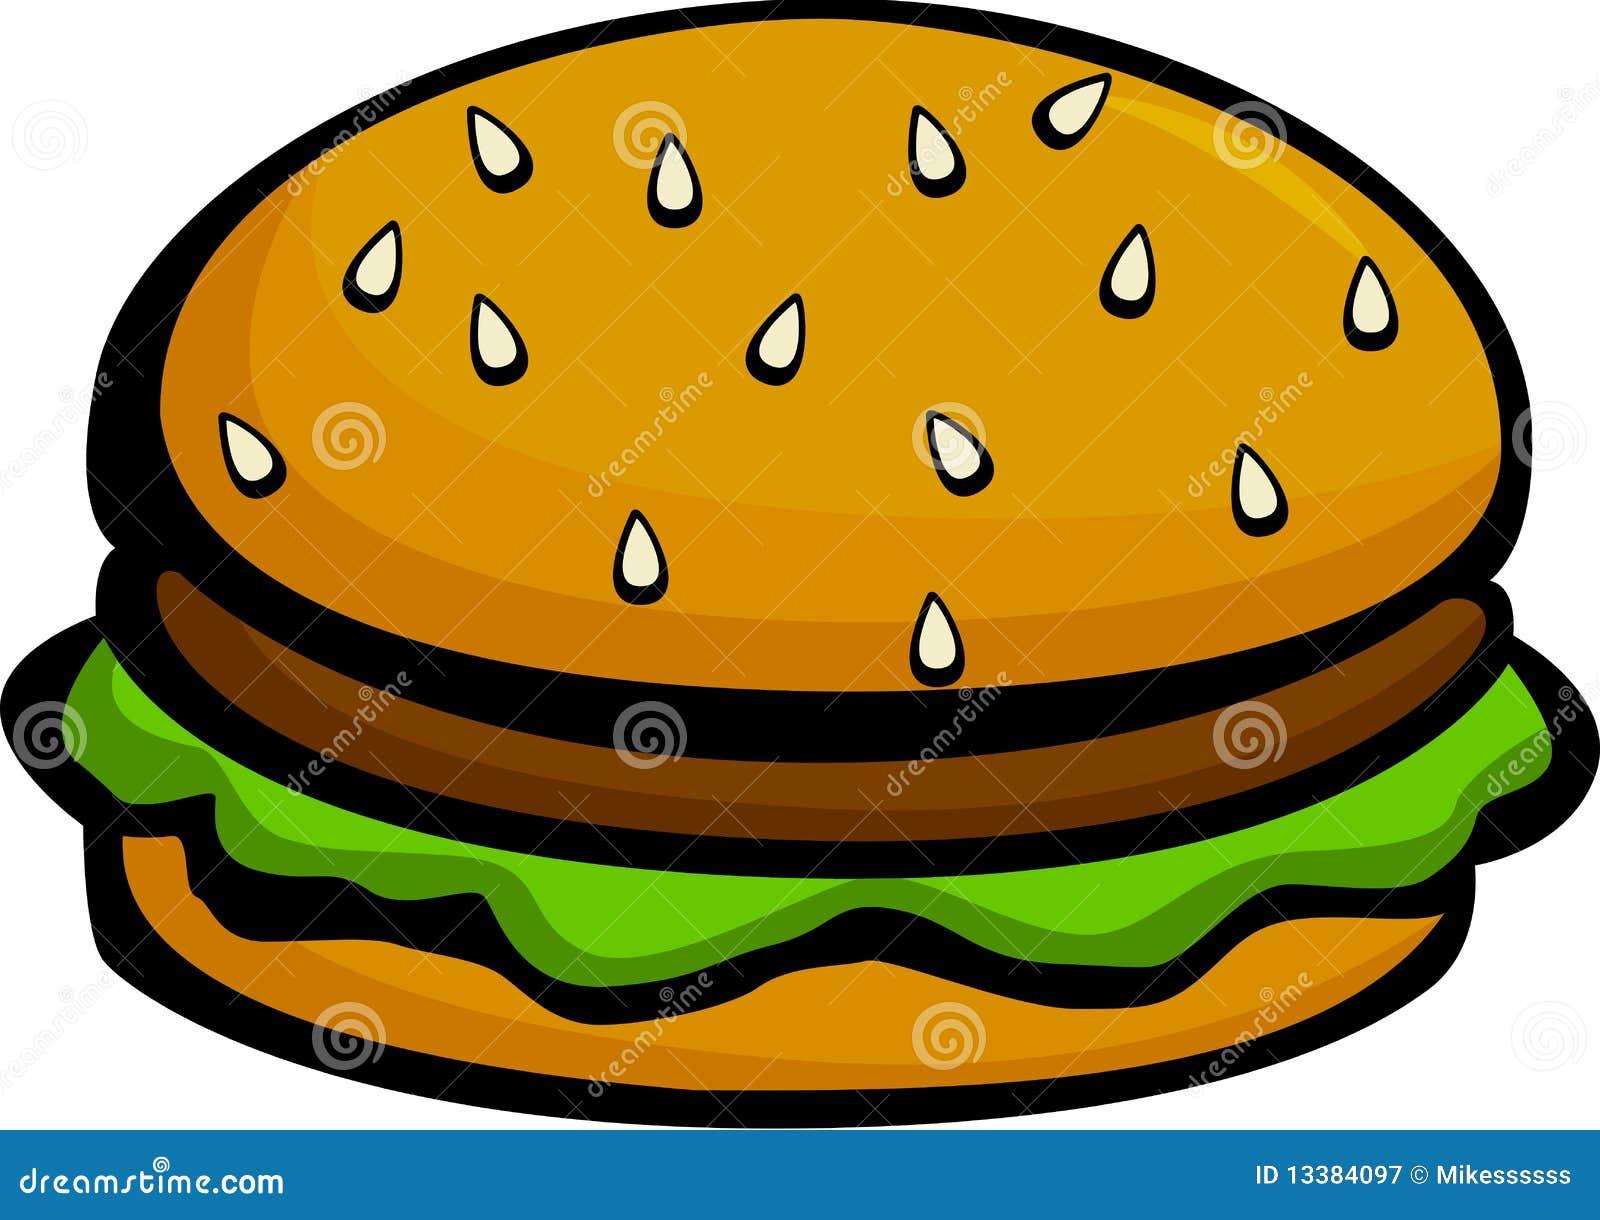 hamburger or cheeseburger vector illustration stock vector burger clip art for kids burger clip art free images